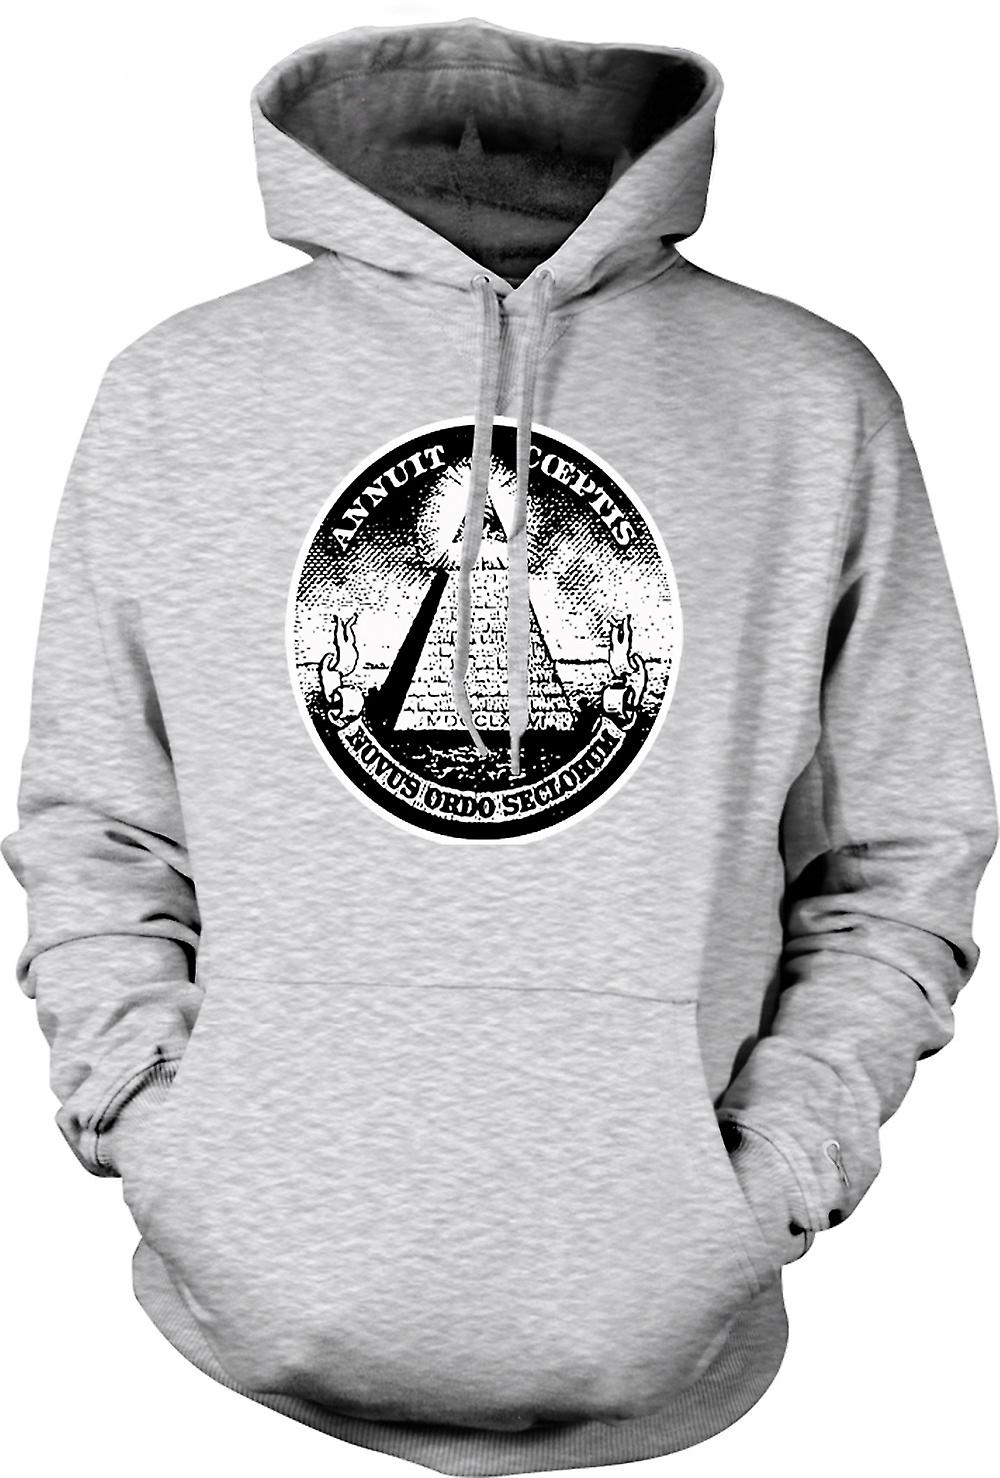 Mens Hoodie - Illuminati - cospirazione dollaro